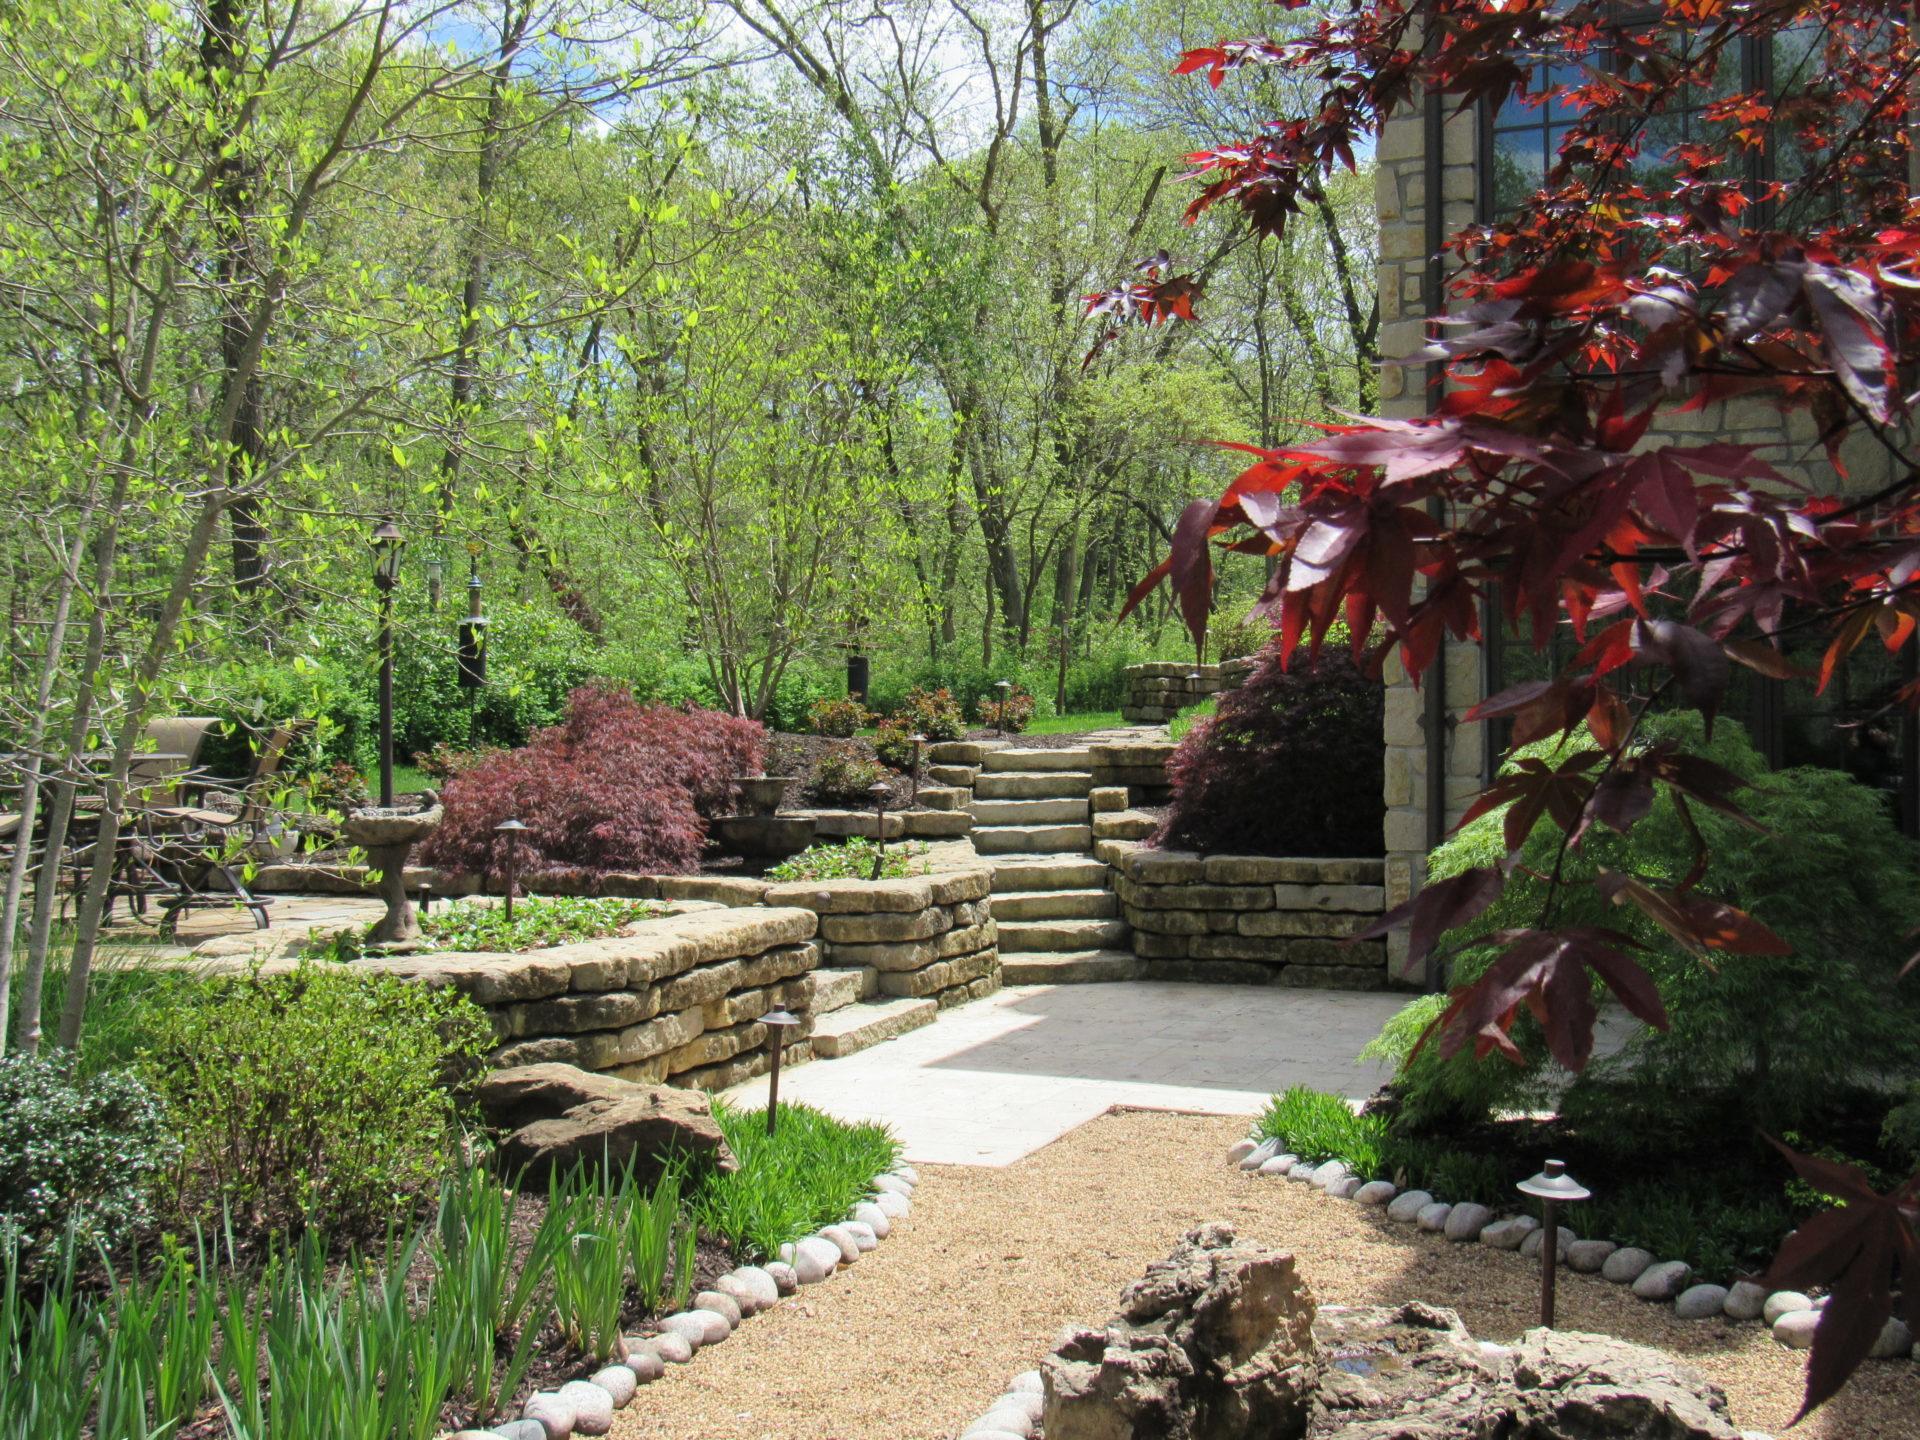 Landscaping Overland Park Ks : Landscaping in overland park ks aspen lawn landscape